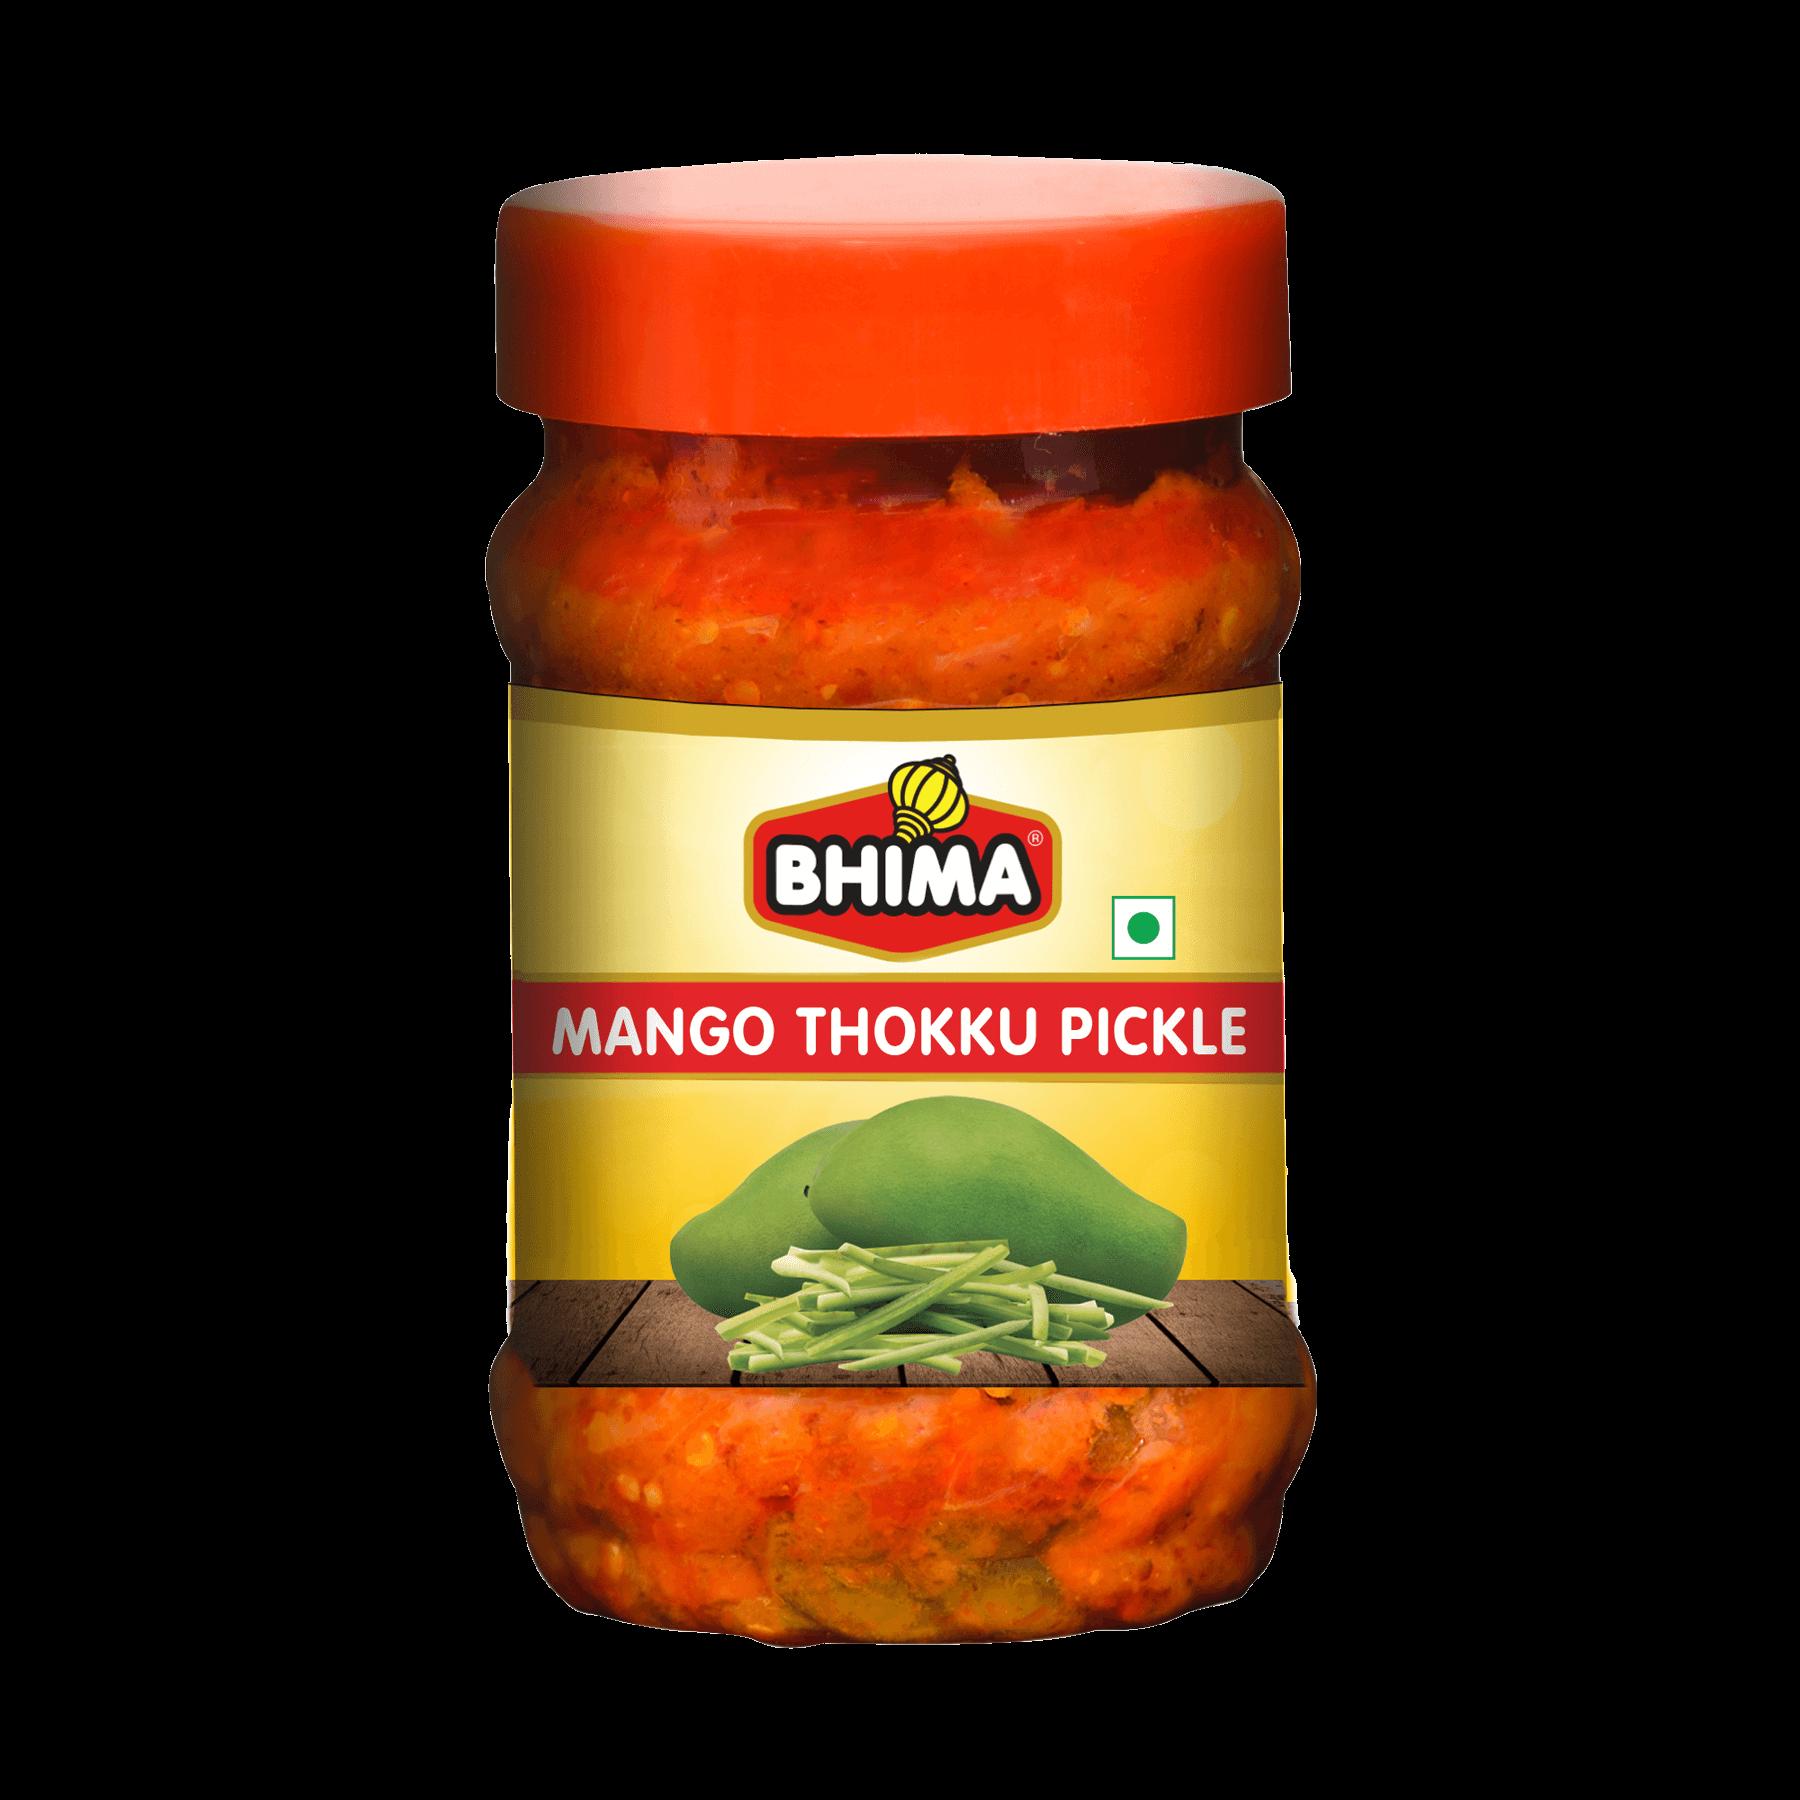 Bhima – Mango Thokku